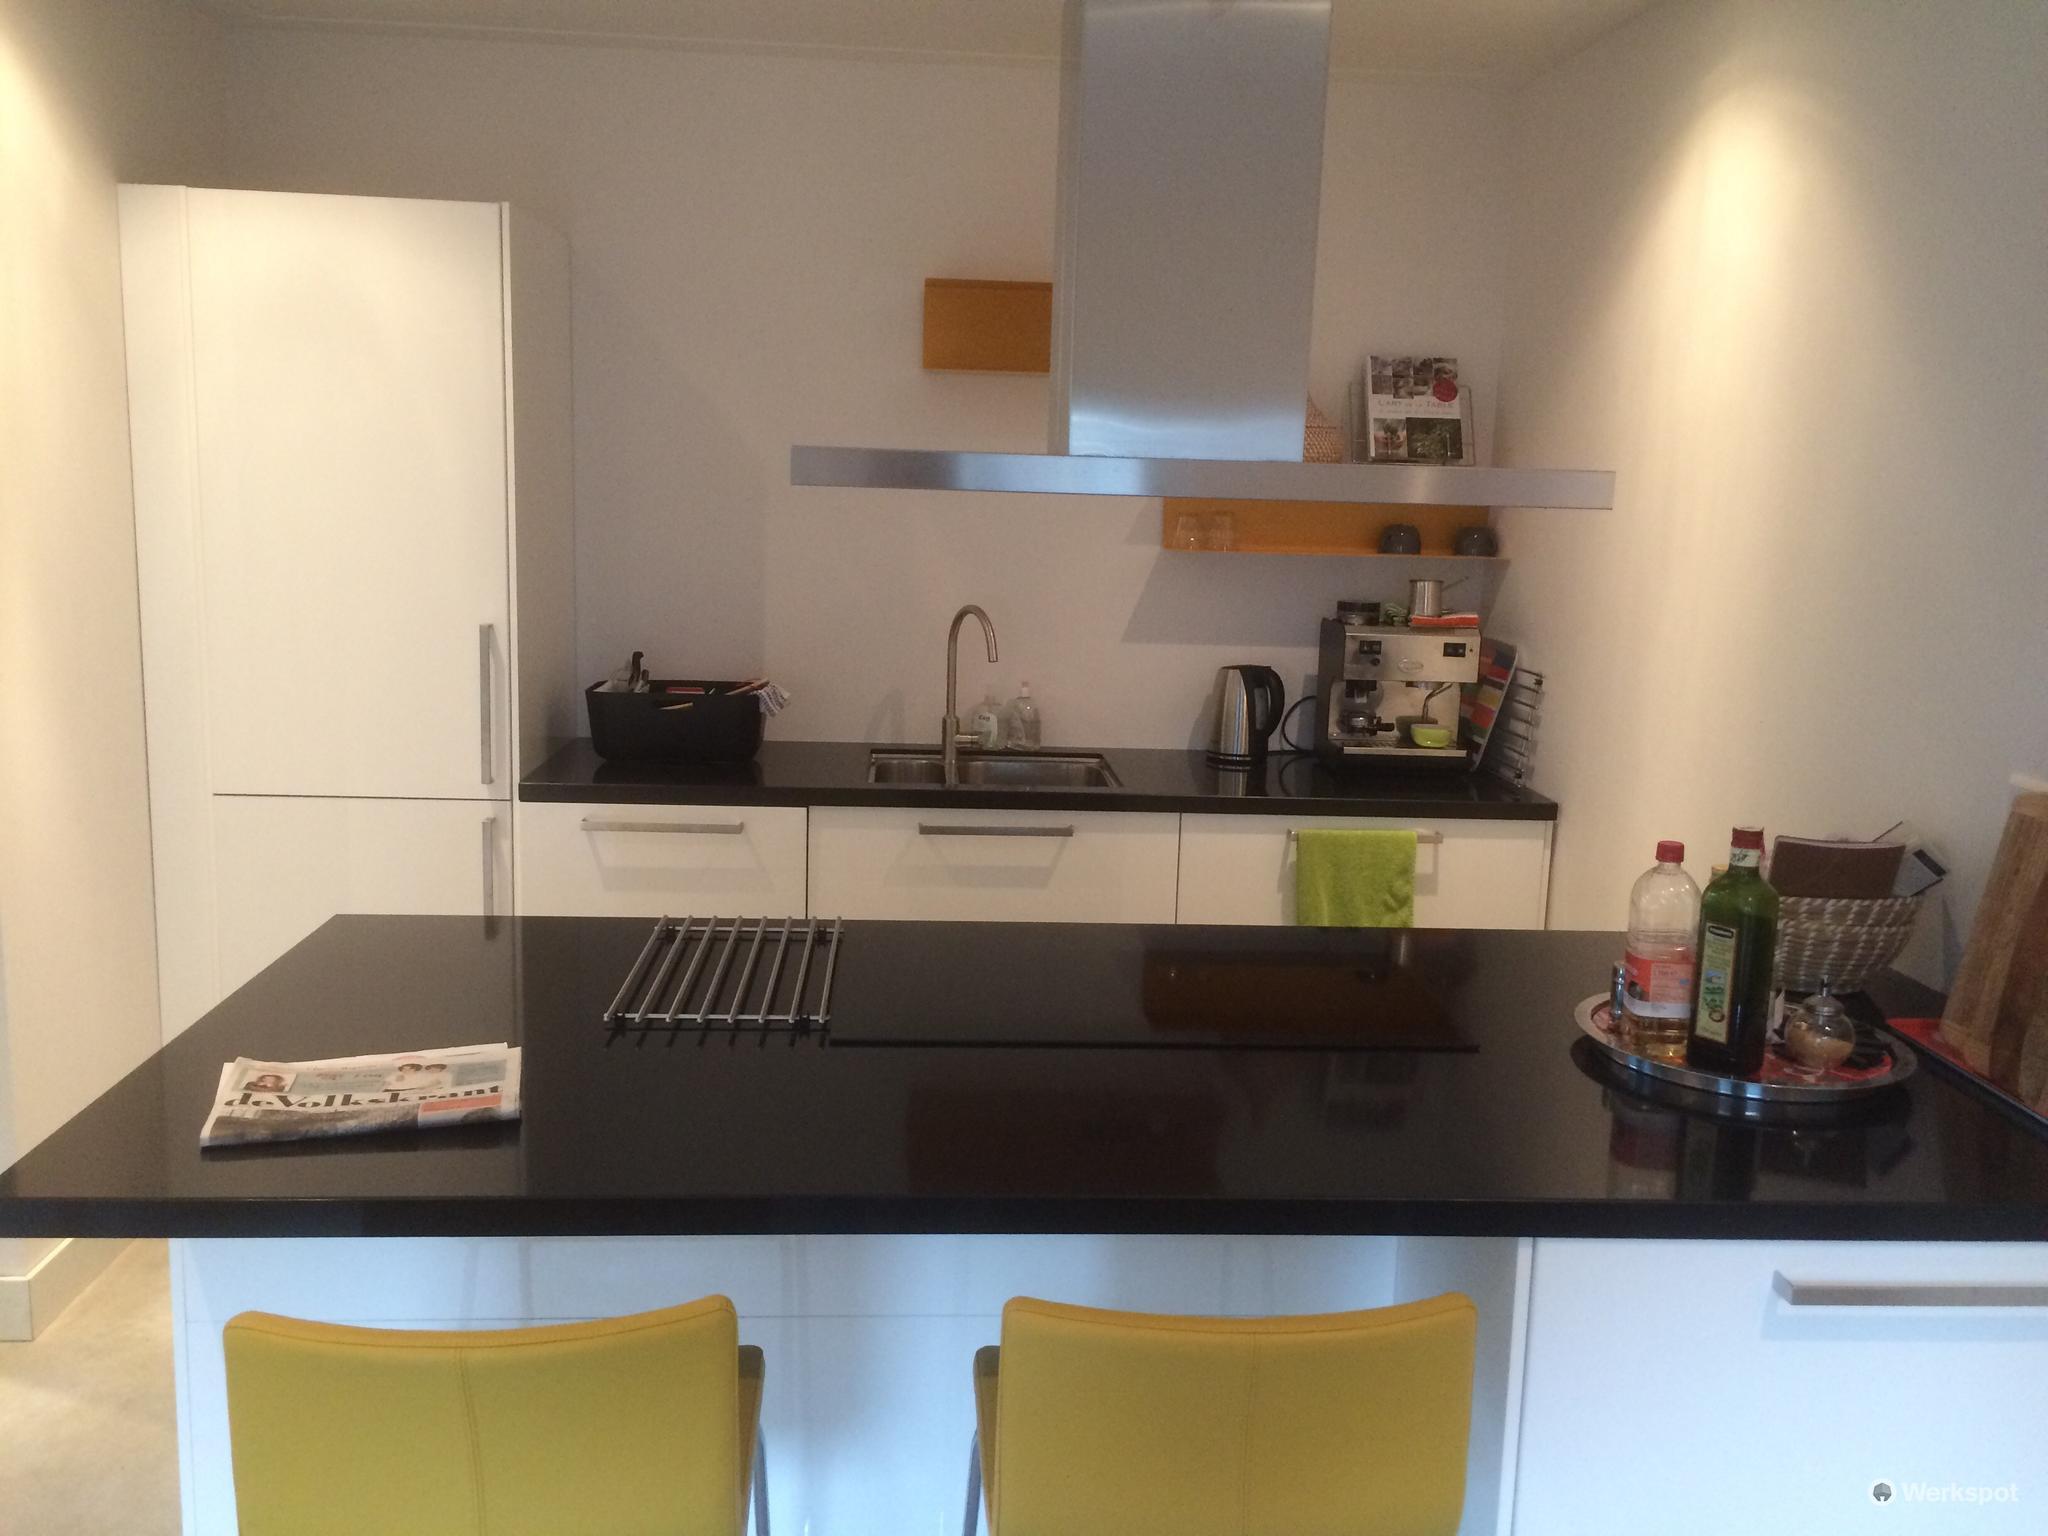 Wand Ikea Keuken : Installatie ikea ringhult keuken wand met spoel koelkast